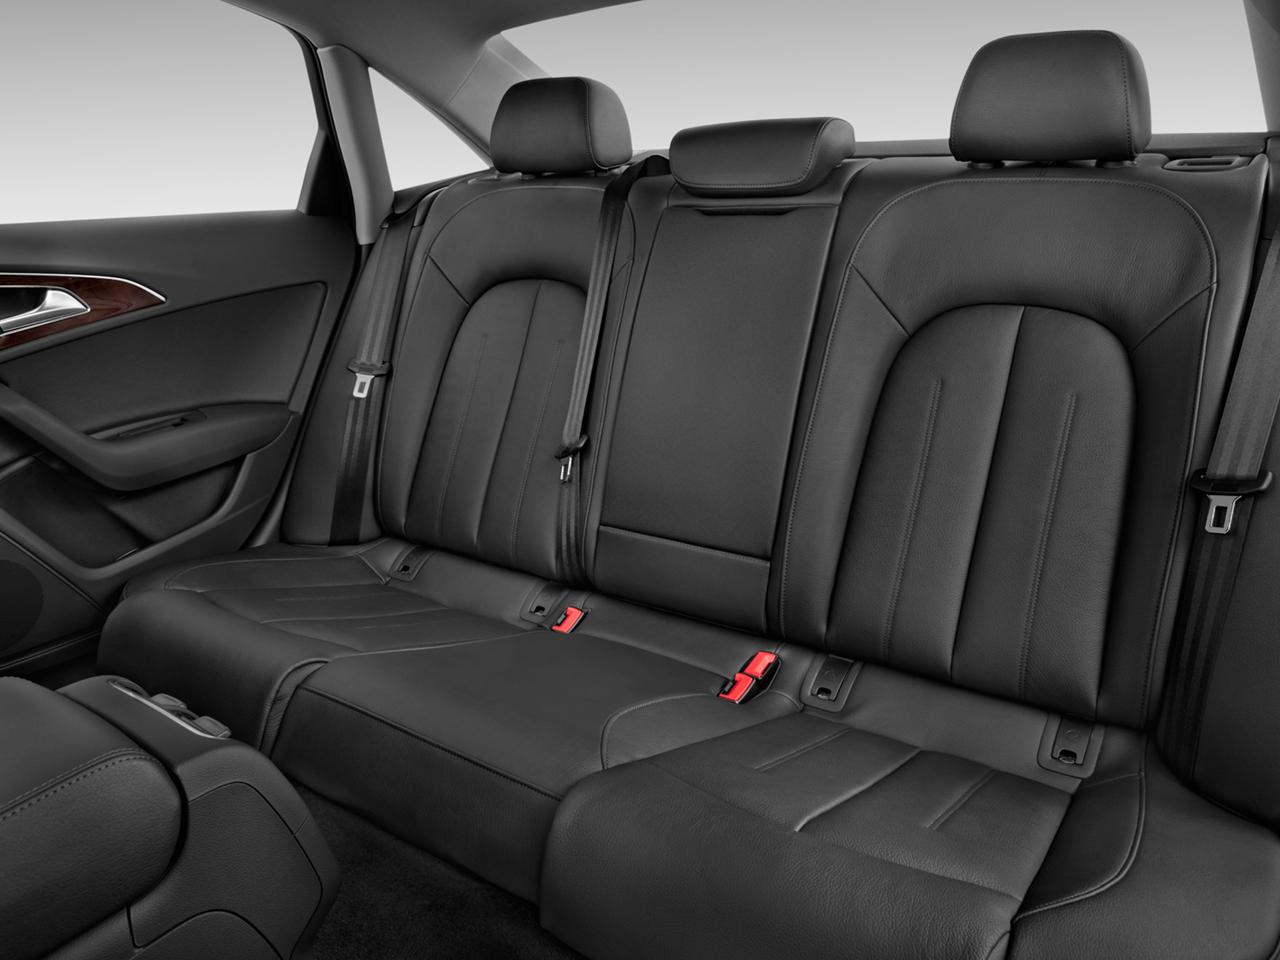 Used Audi For Sale In Waipahu HI Aloha Kia Leeward - Audi car seat